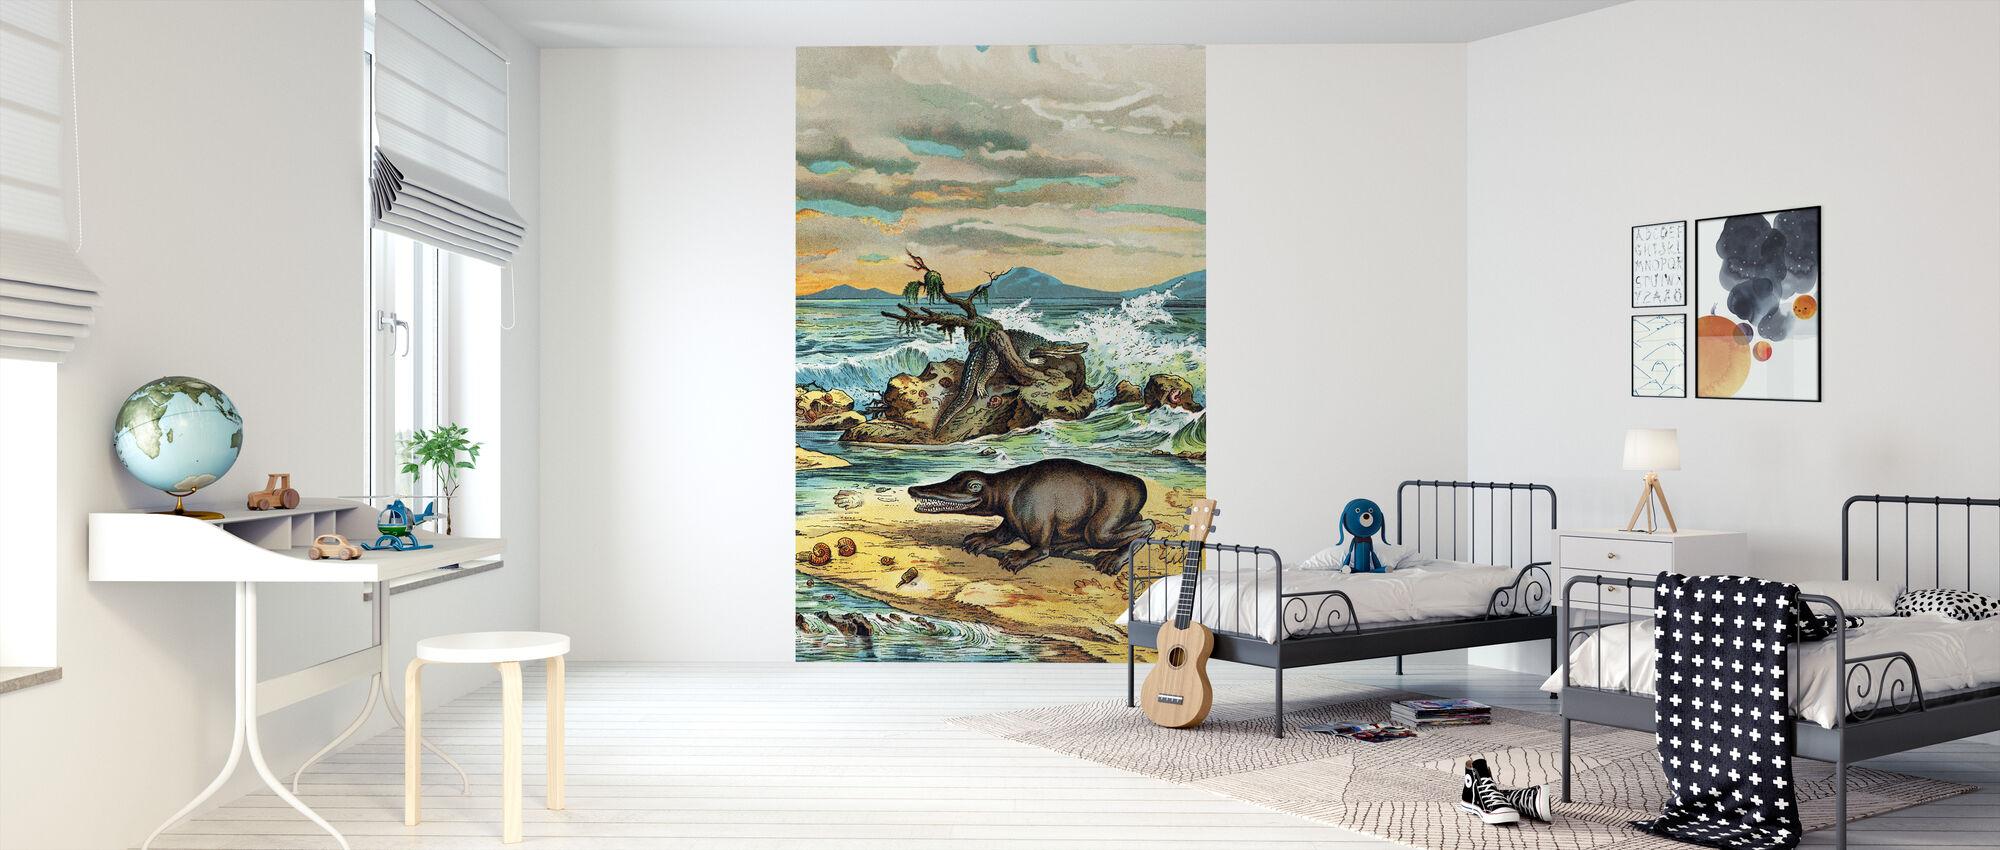 Triassic Coastal Environment - Wallpaper - Kids Room